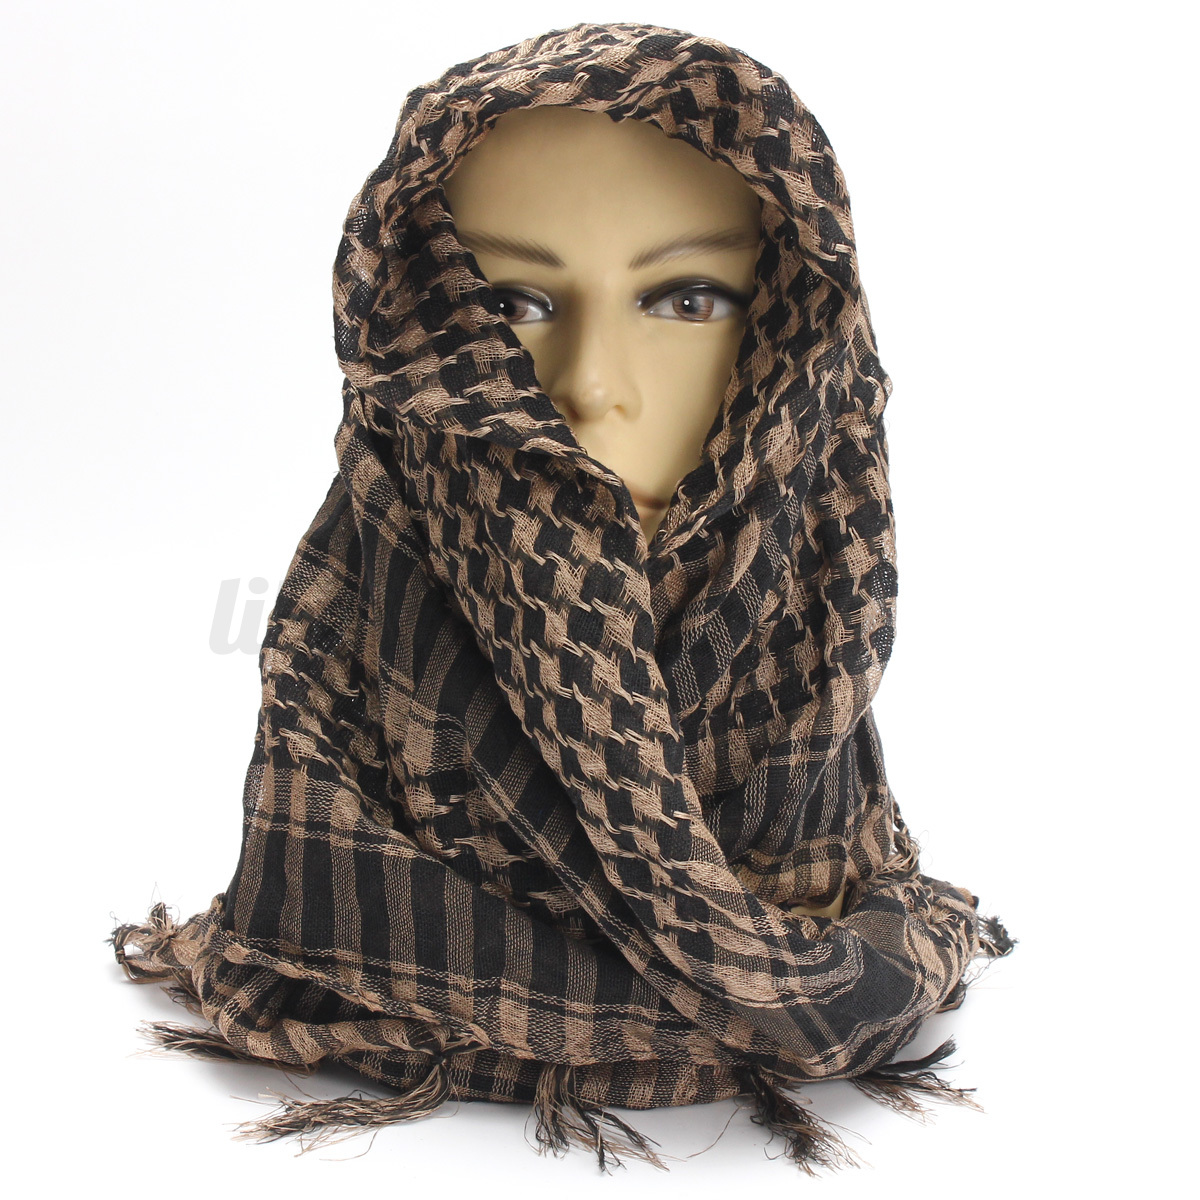 Shemagh-Militare-sciarpa-Tattico-Keffiyeh-Uomo-Donna-Scarf-Foulard-Kefiah-Araba miniatura 11